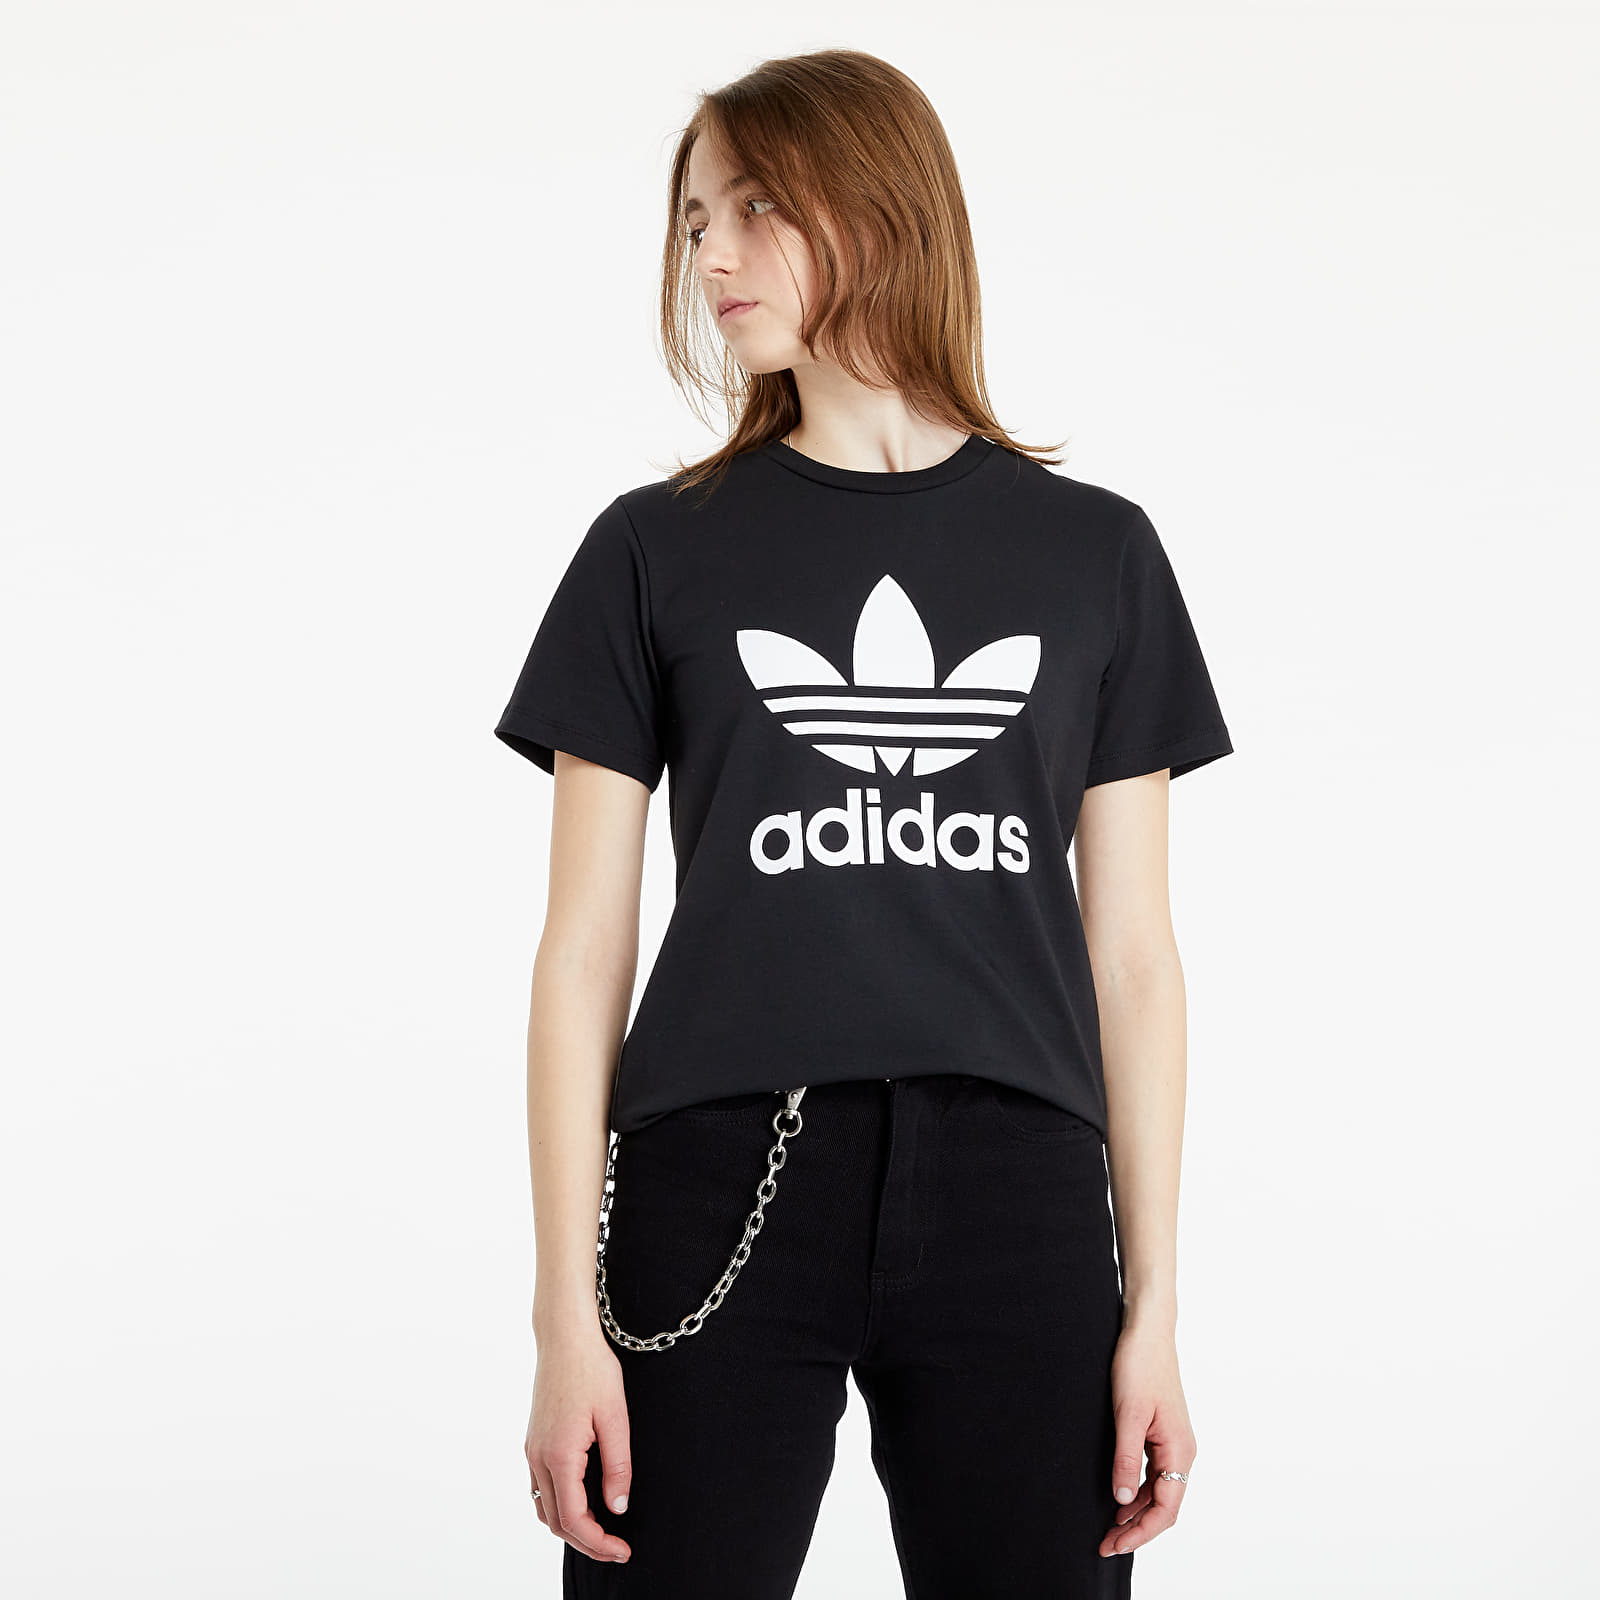 adidas Adicolor Classics Trefoil Tee Black S/36